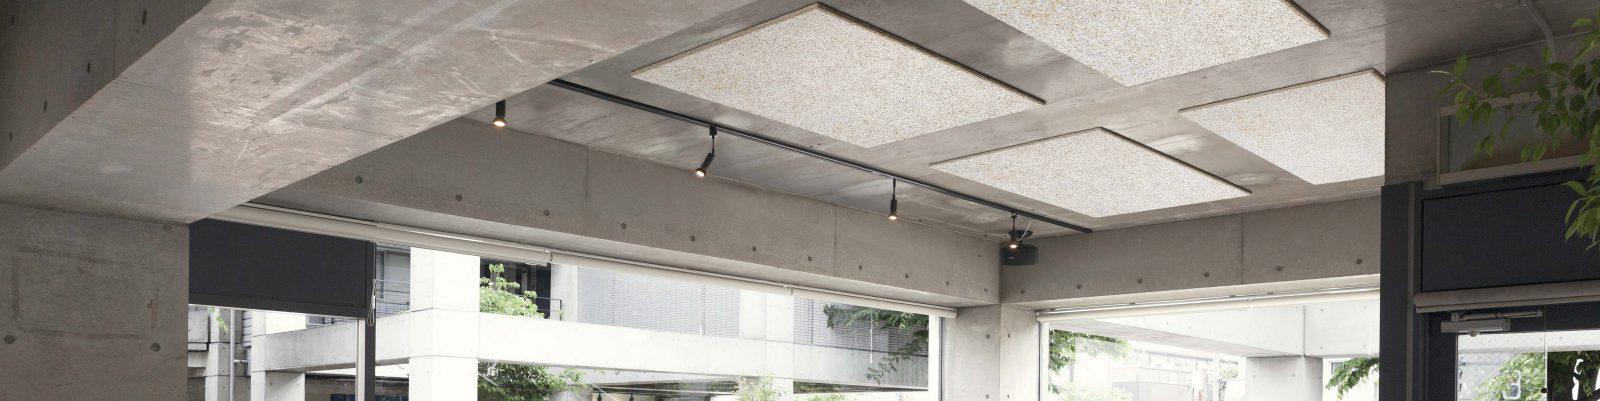 Tectum Finale Ceiling Panels On Designer Pages